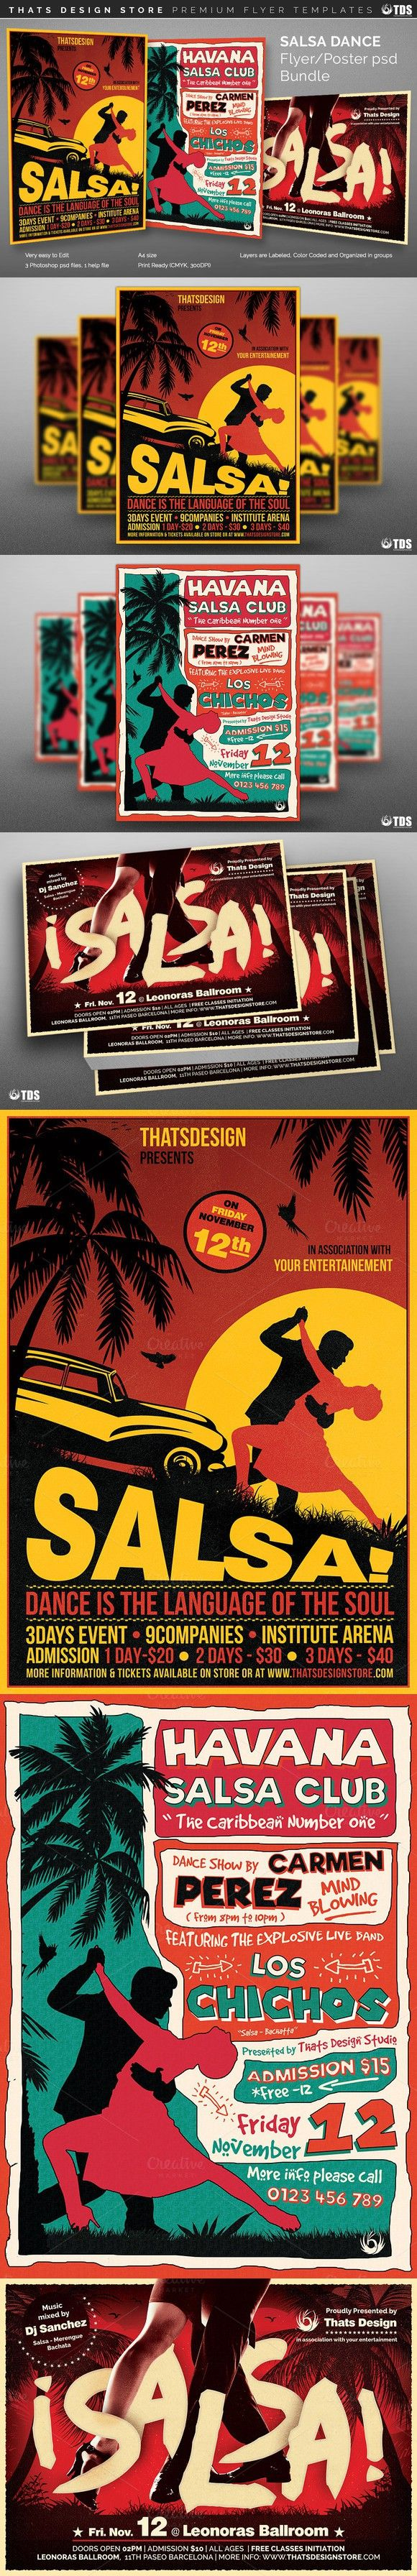 Poster design for coaching institute - Salsa Dance Flyer Bundle